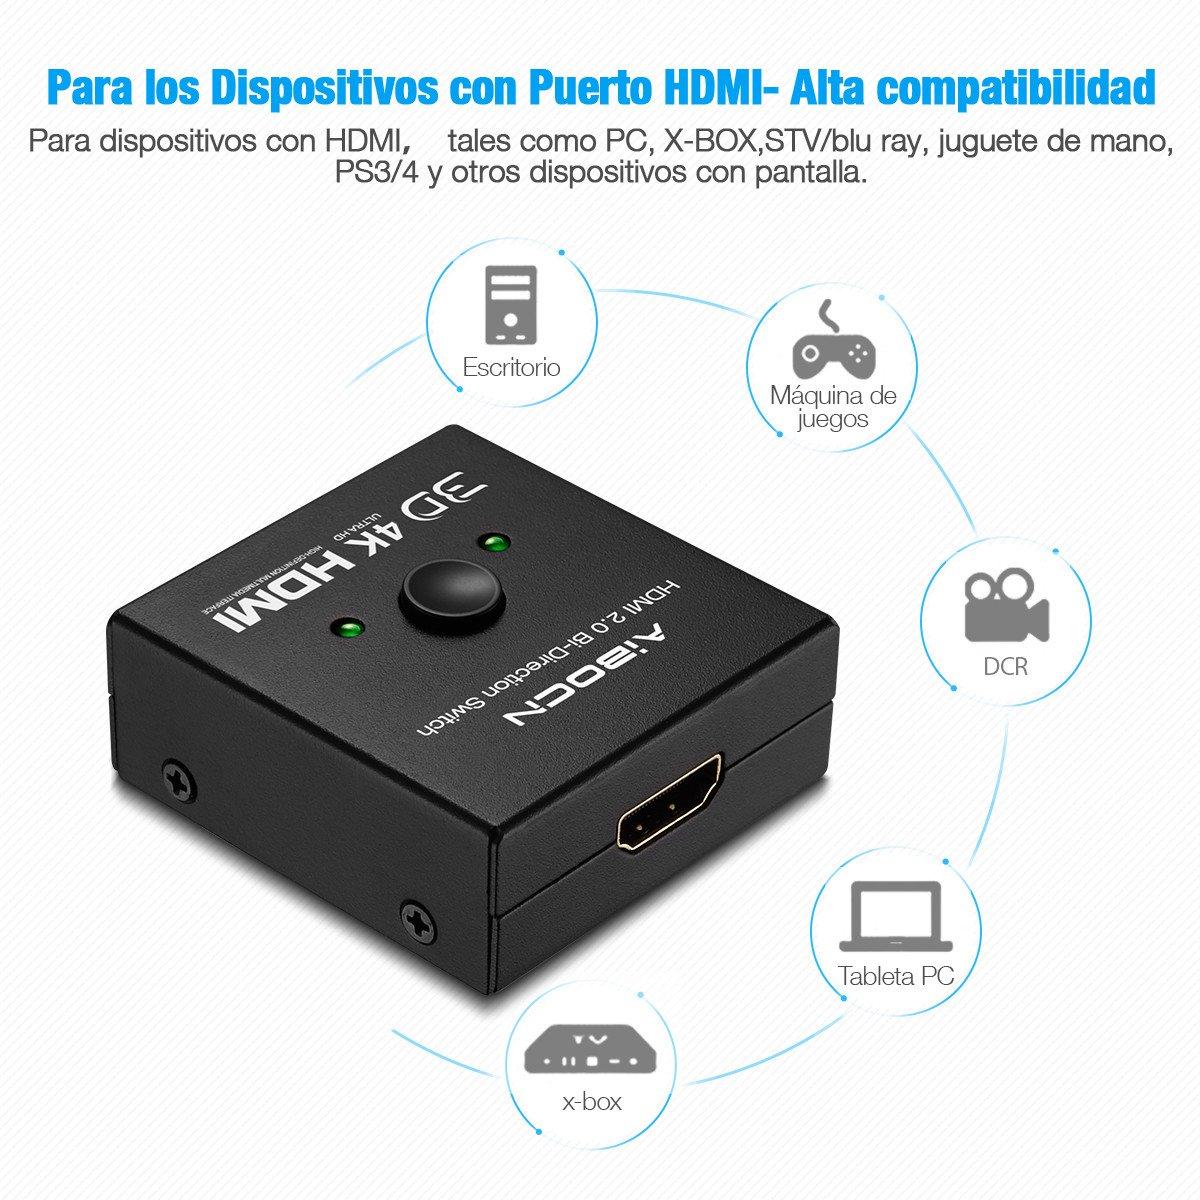 Aibocn Conmutador HDMI Switch Divisor 4K HDMI Bidireccional 2x1 Soporta 4K 3D 1080P para TV/PS4/PS3/XboX/DVD BLU-Ray,Color Negro